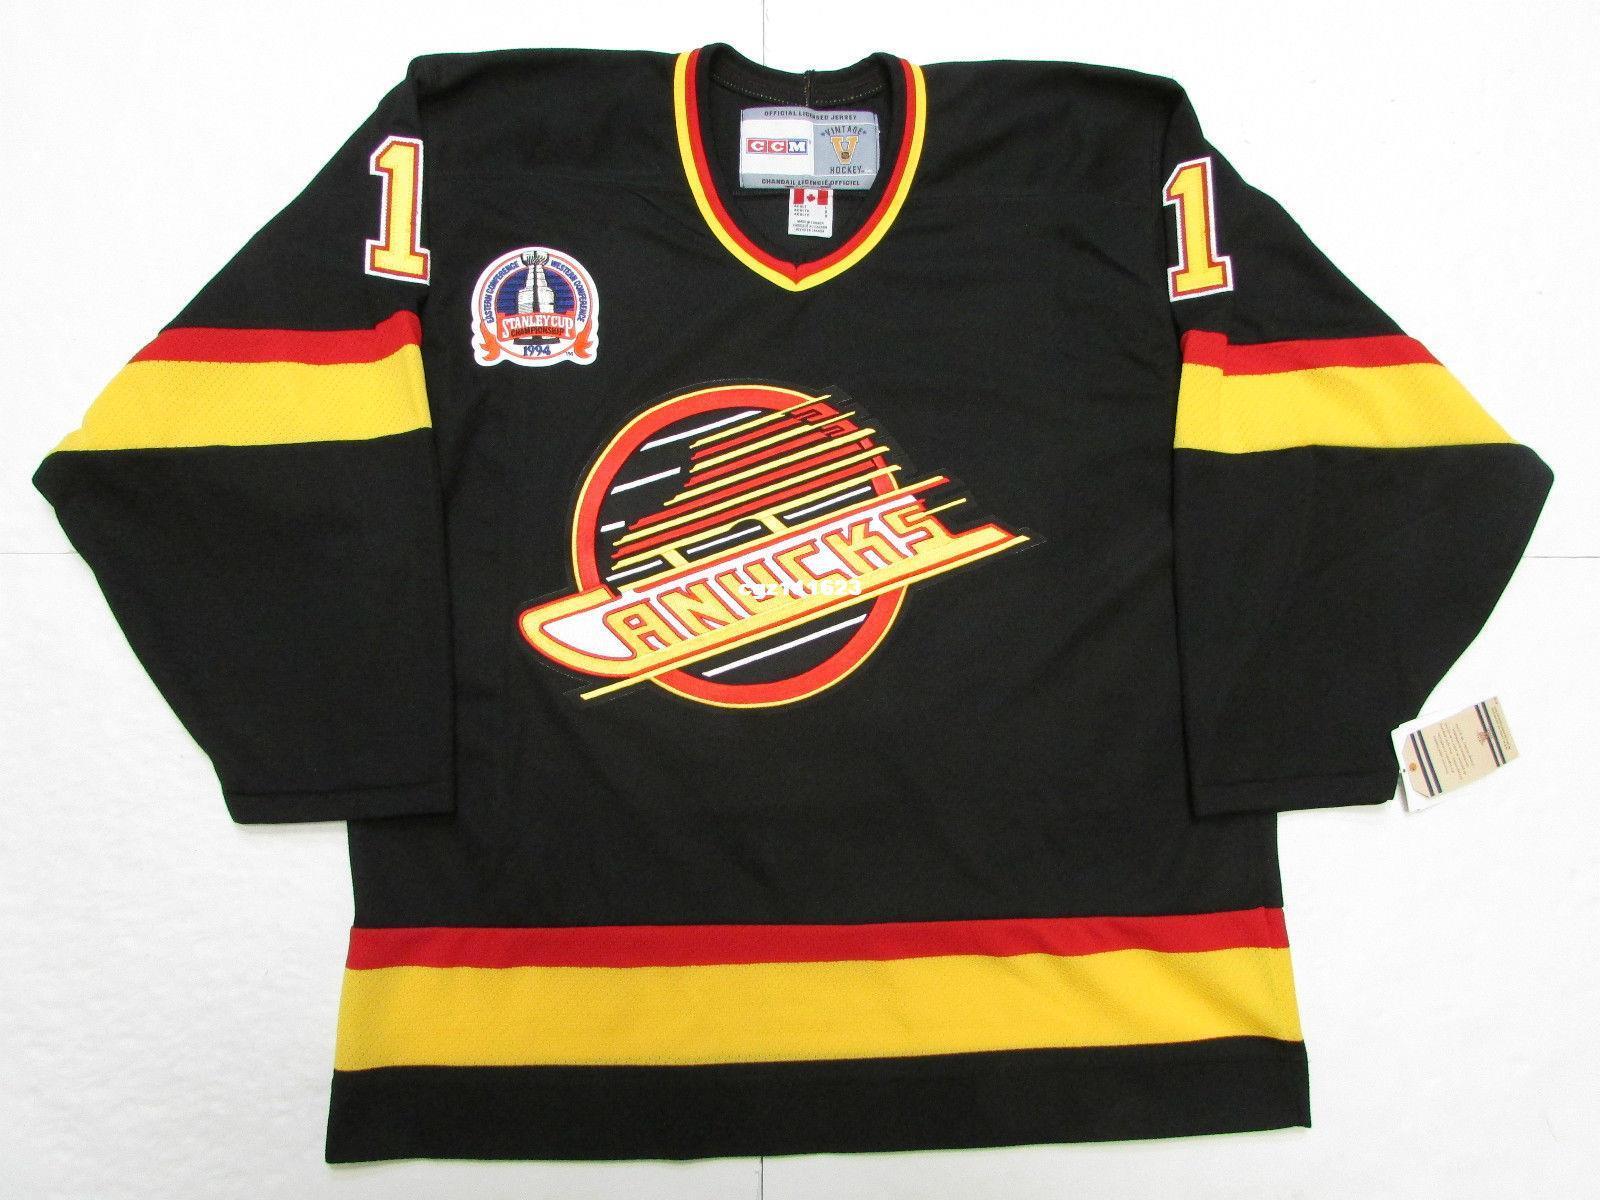 44aec11da ... cheap custom mclean vancouver canucks 1994 stanley cup vintage ccm nhl  hockey jersey black throwback jerseys